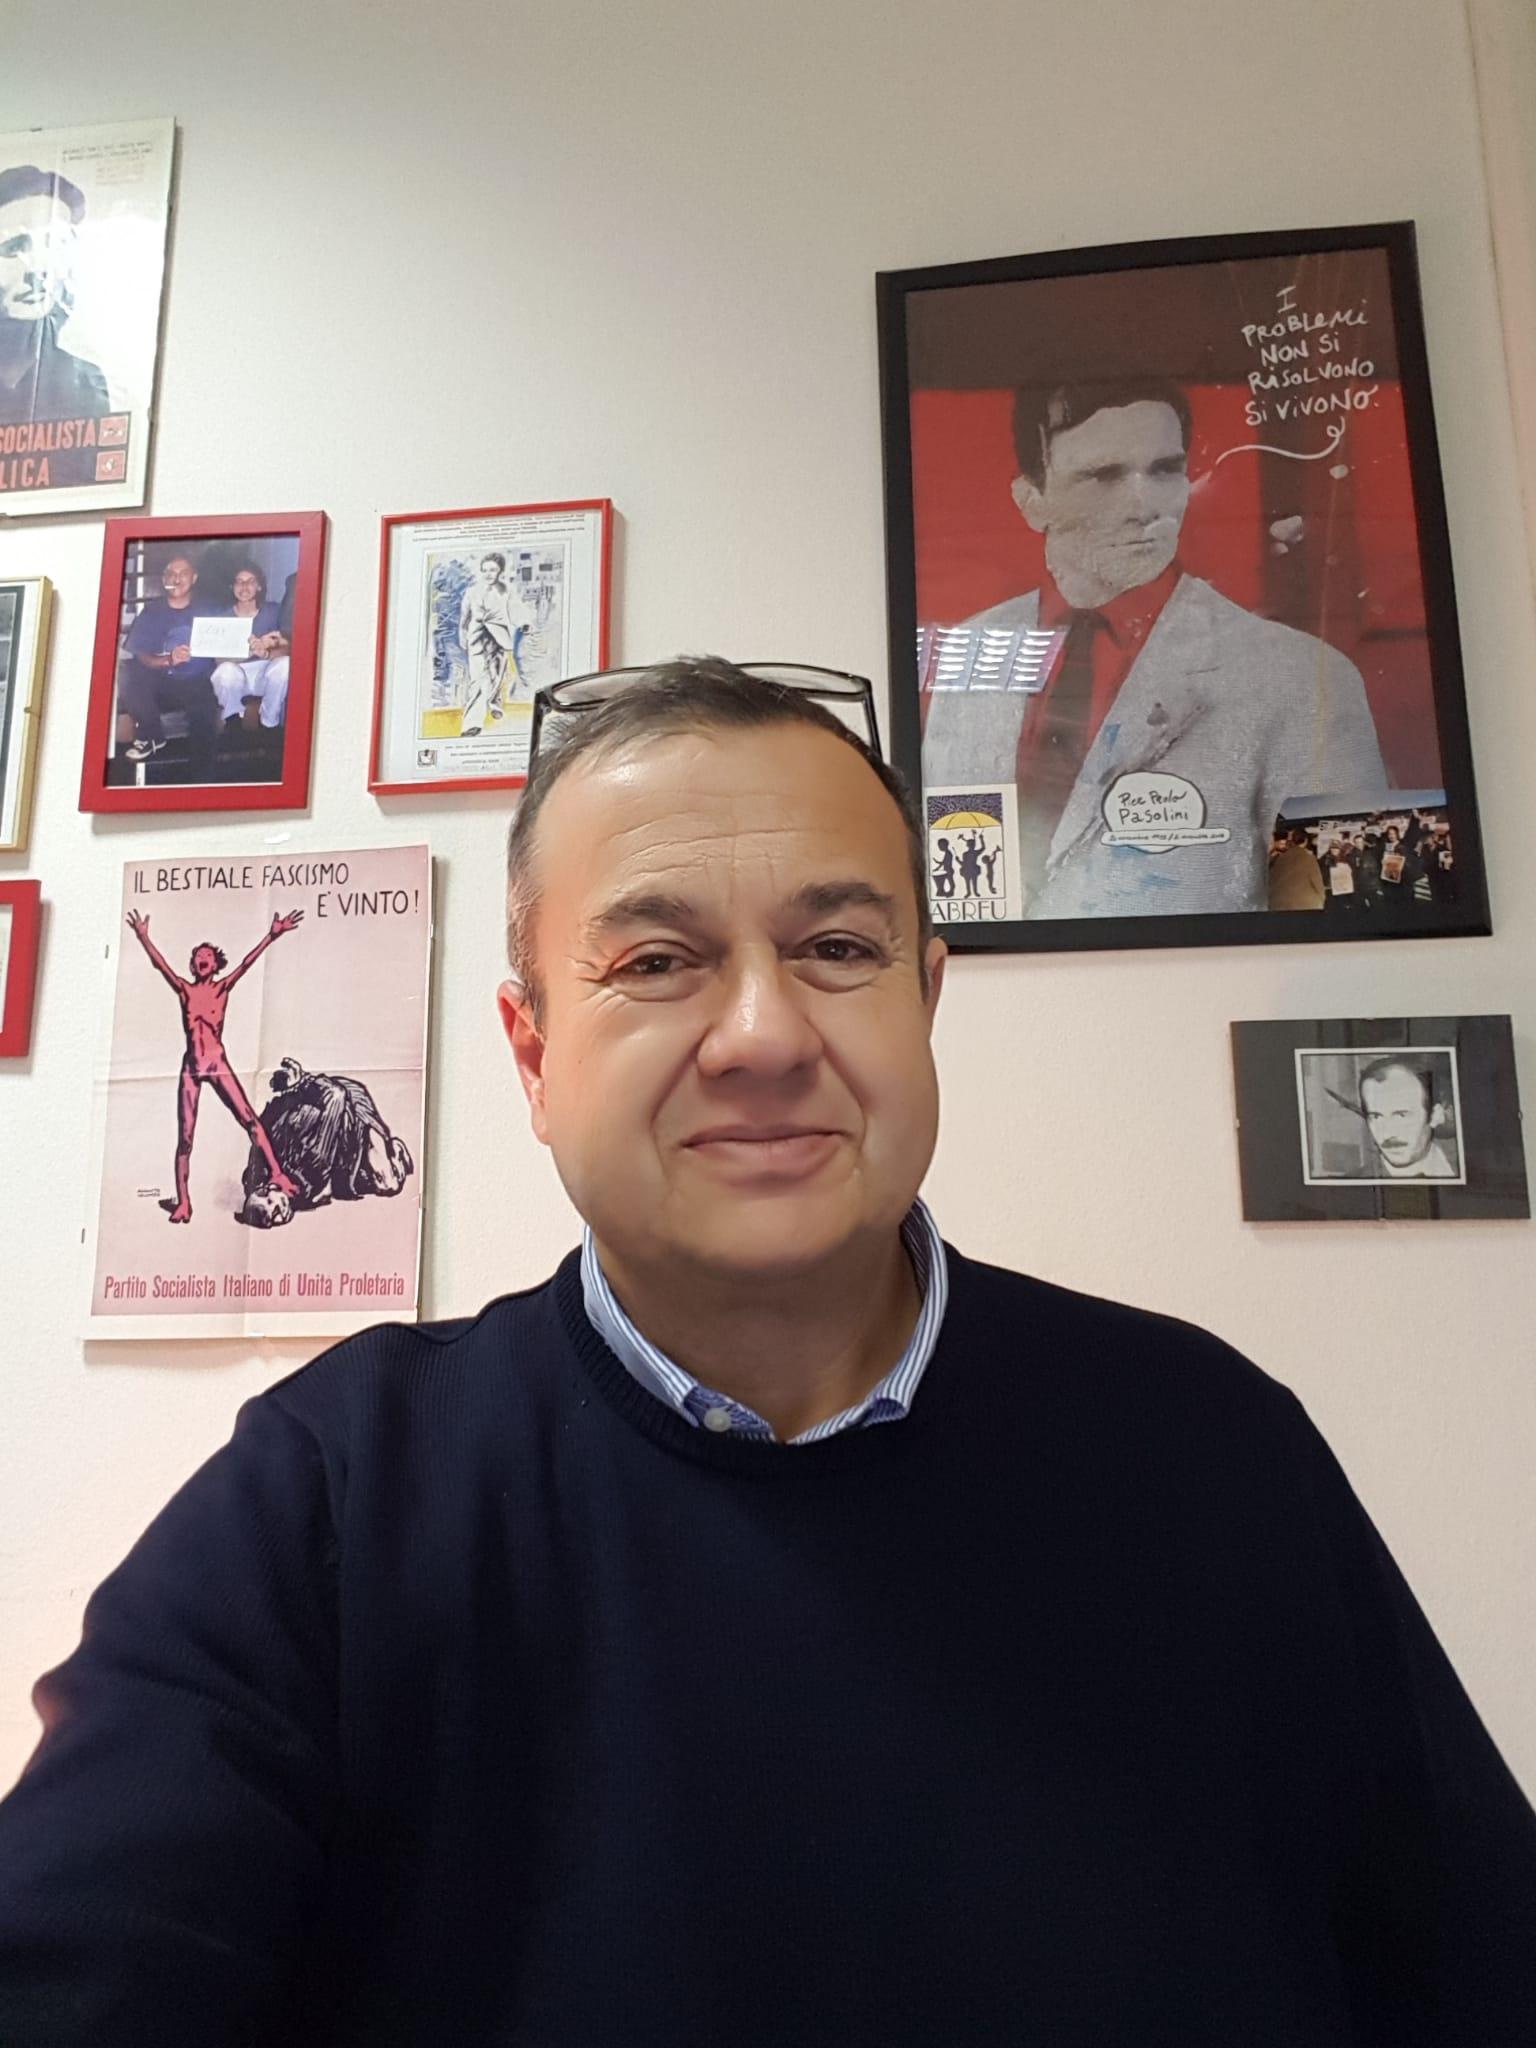 gianluca_mengozzi-portavoce-regionale-del-Forum-Terzo-Settore